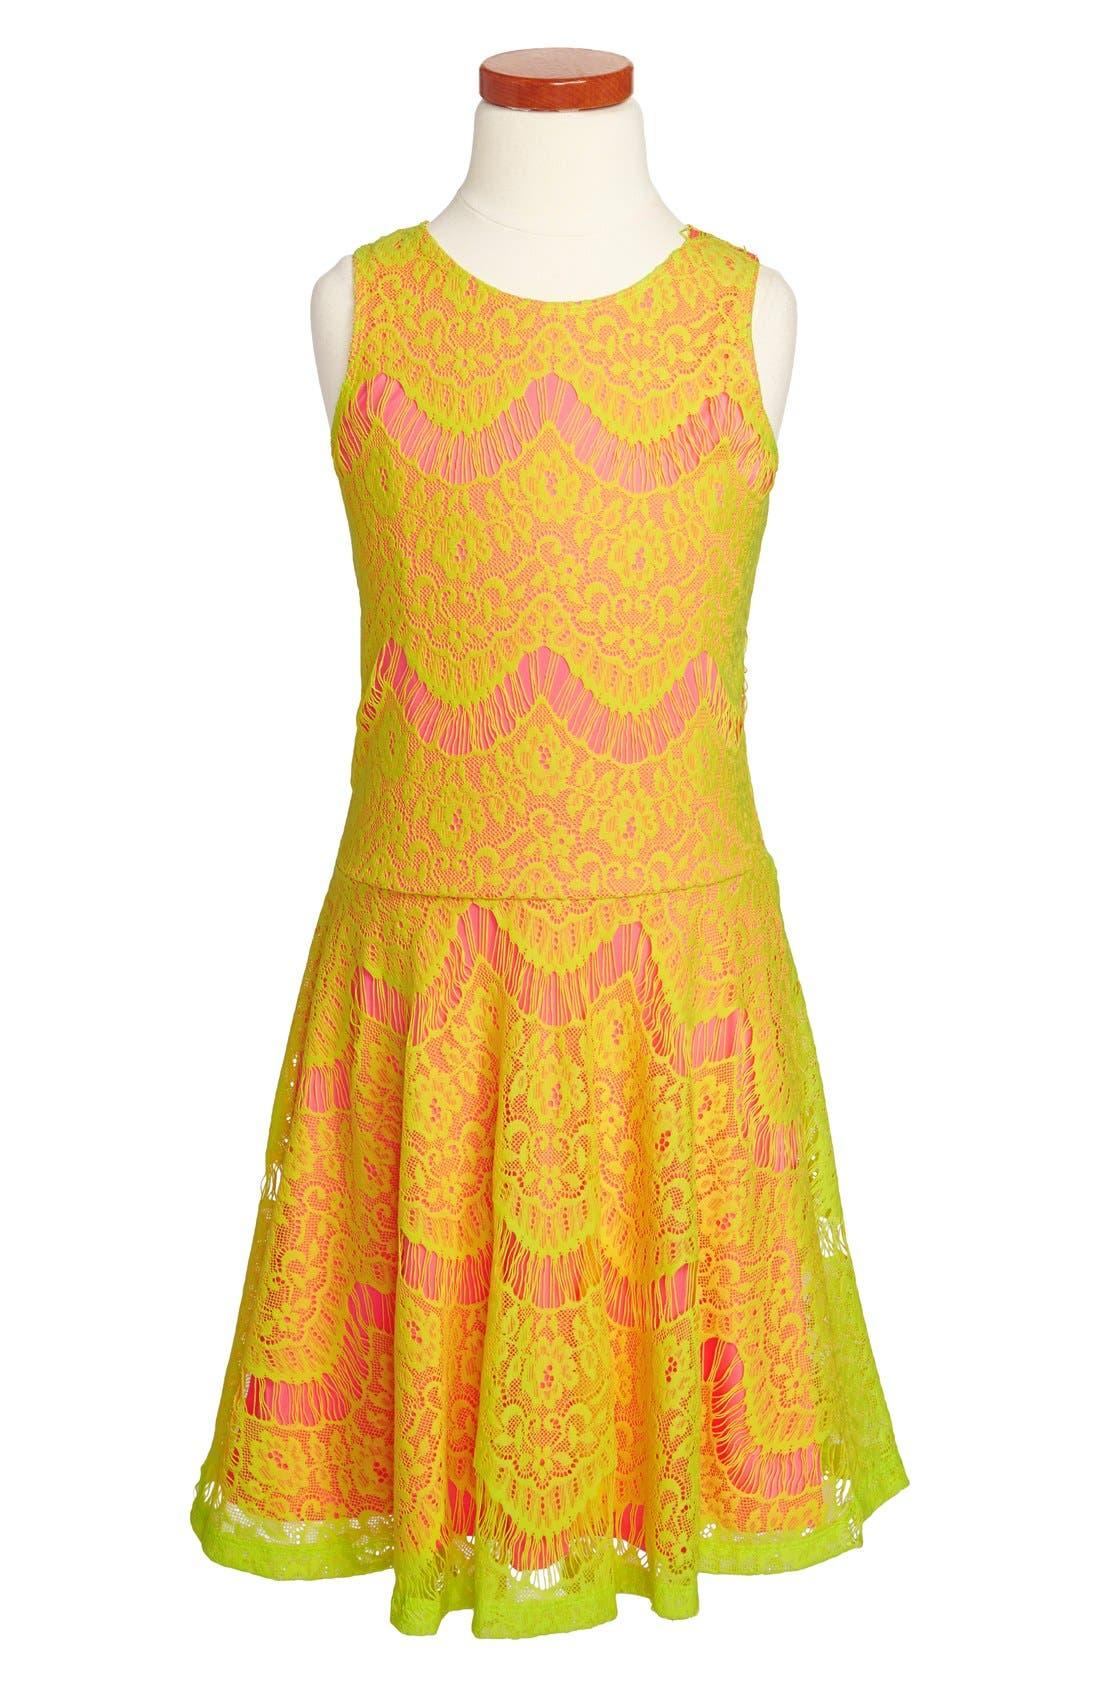 Alternate Image 1 Selected - Elisa B Lace Skater Dress (Big Girls)